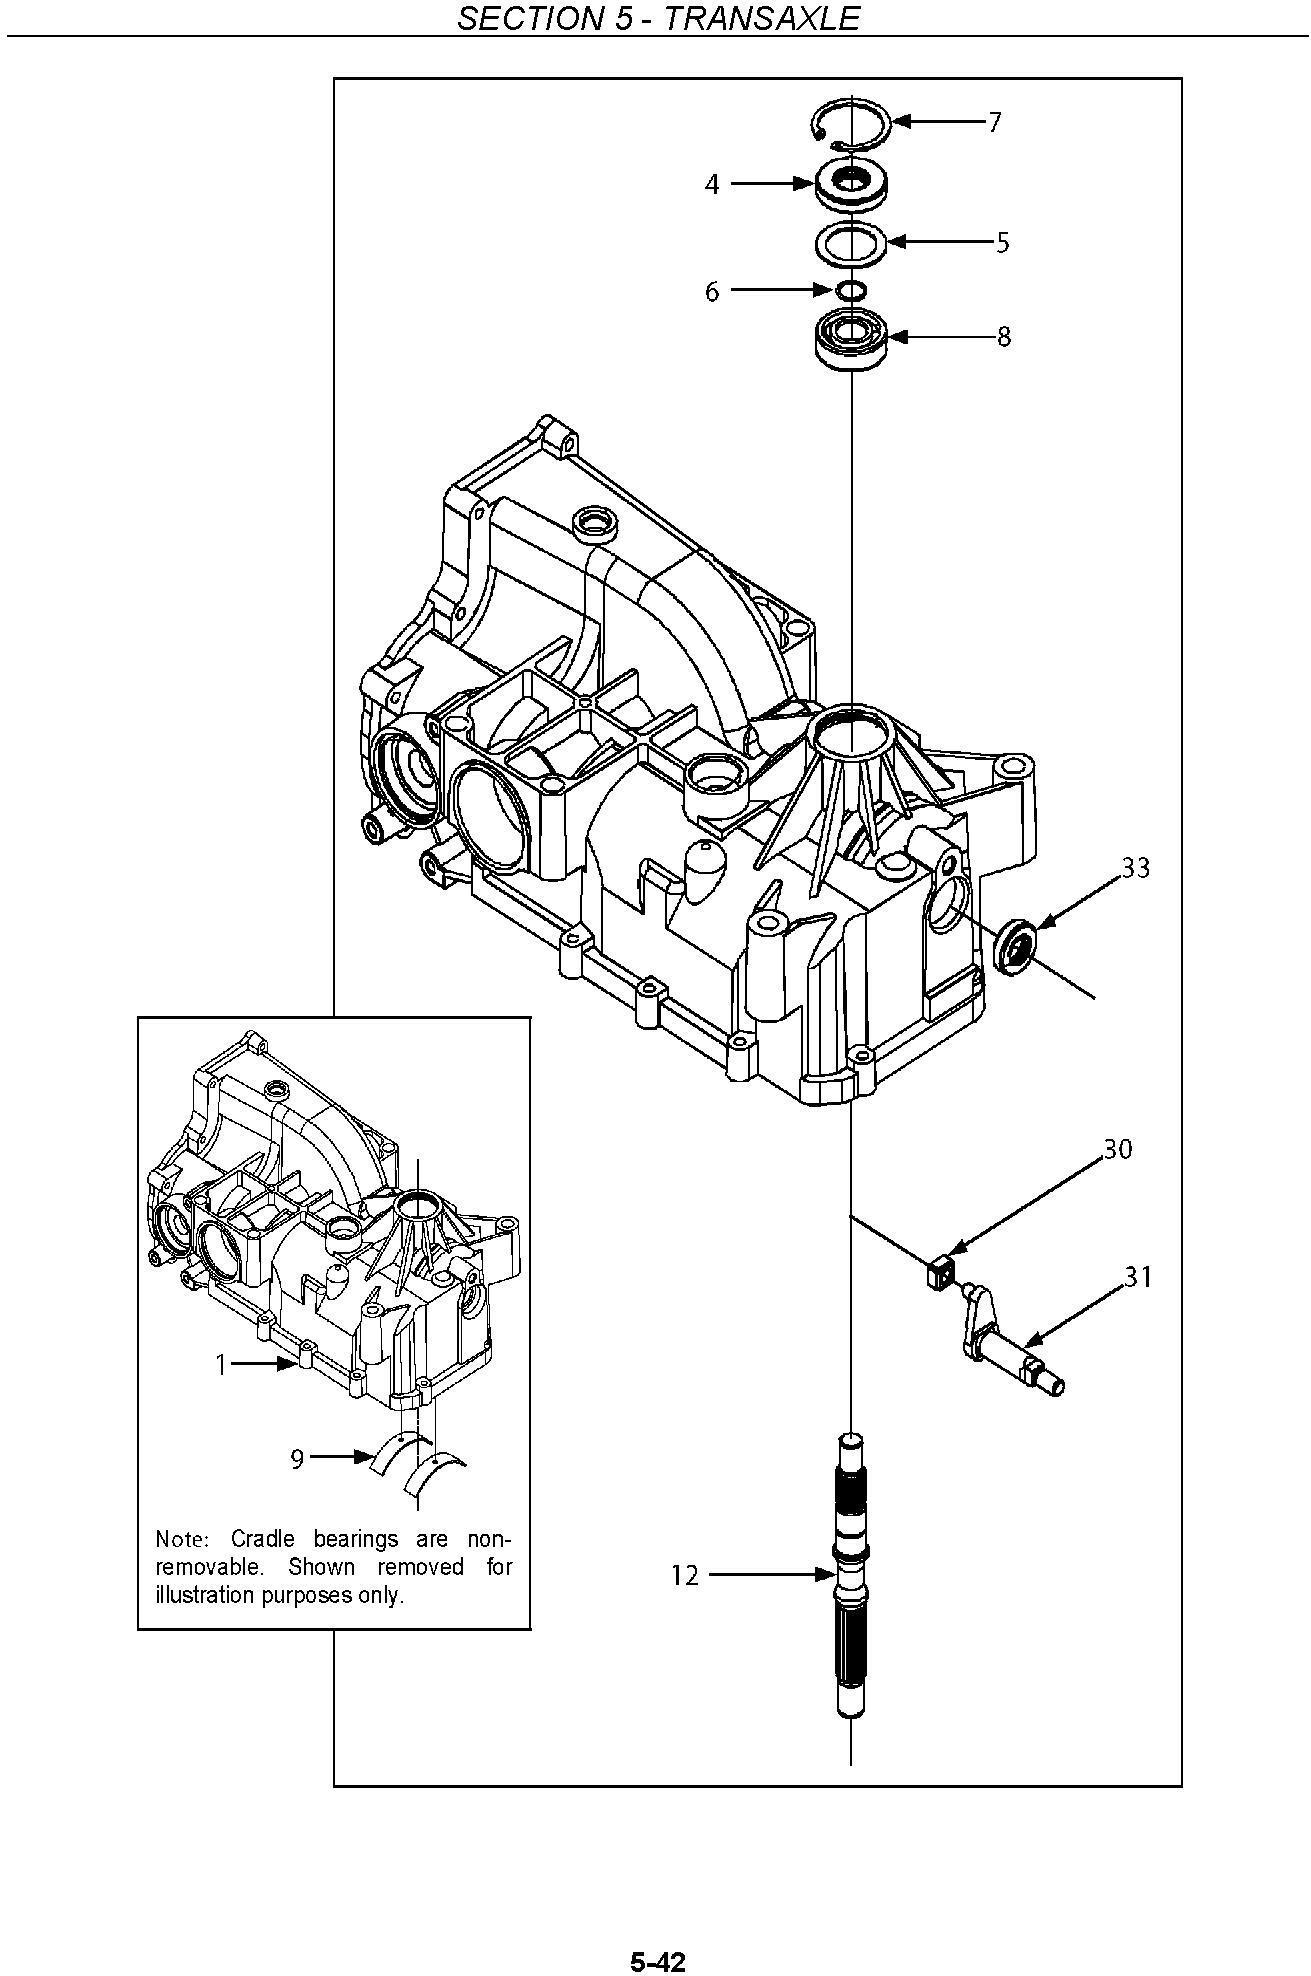 New Holland MZ19H Zero Turn Radious Mower Service Manual - 3